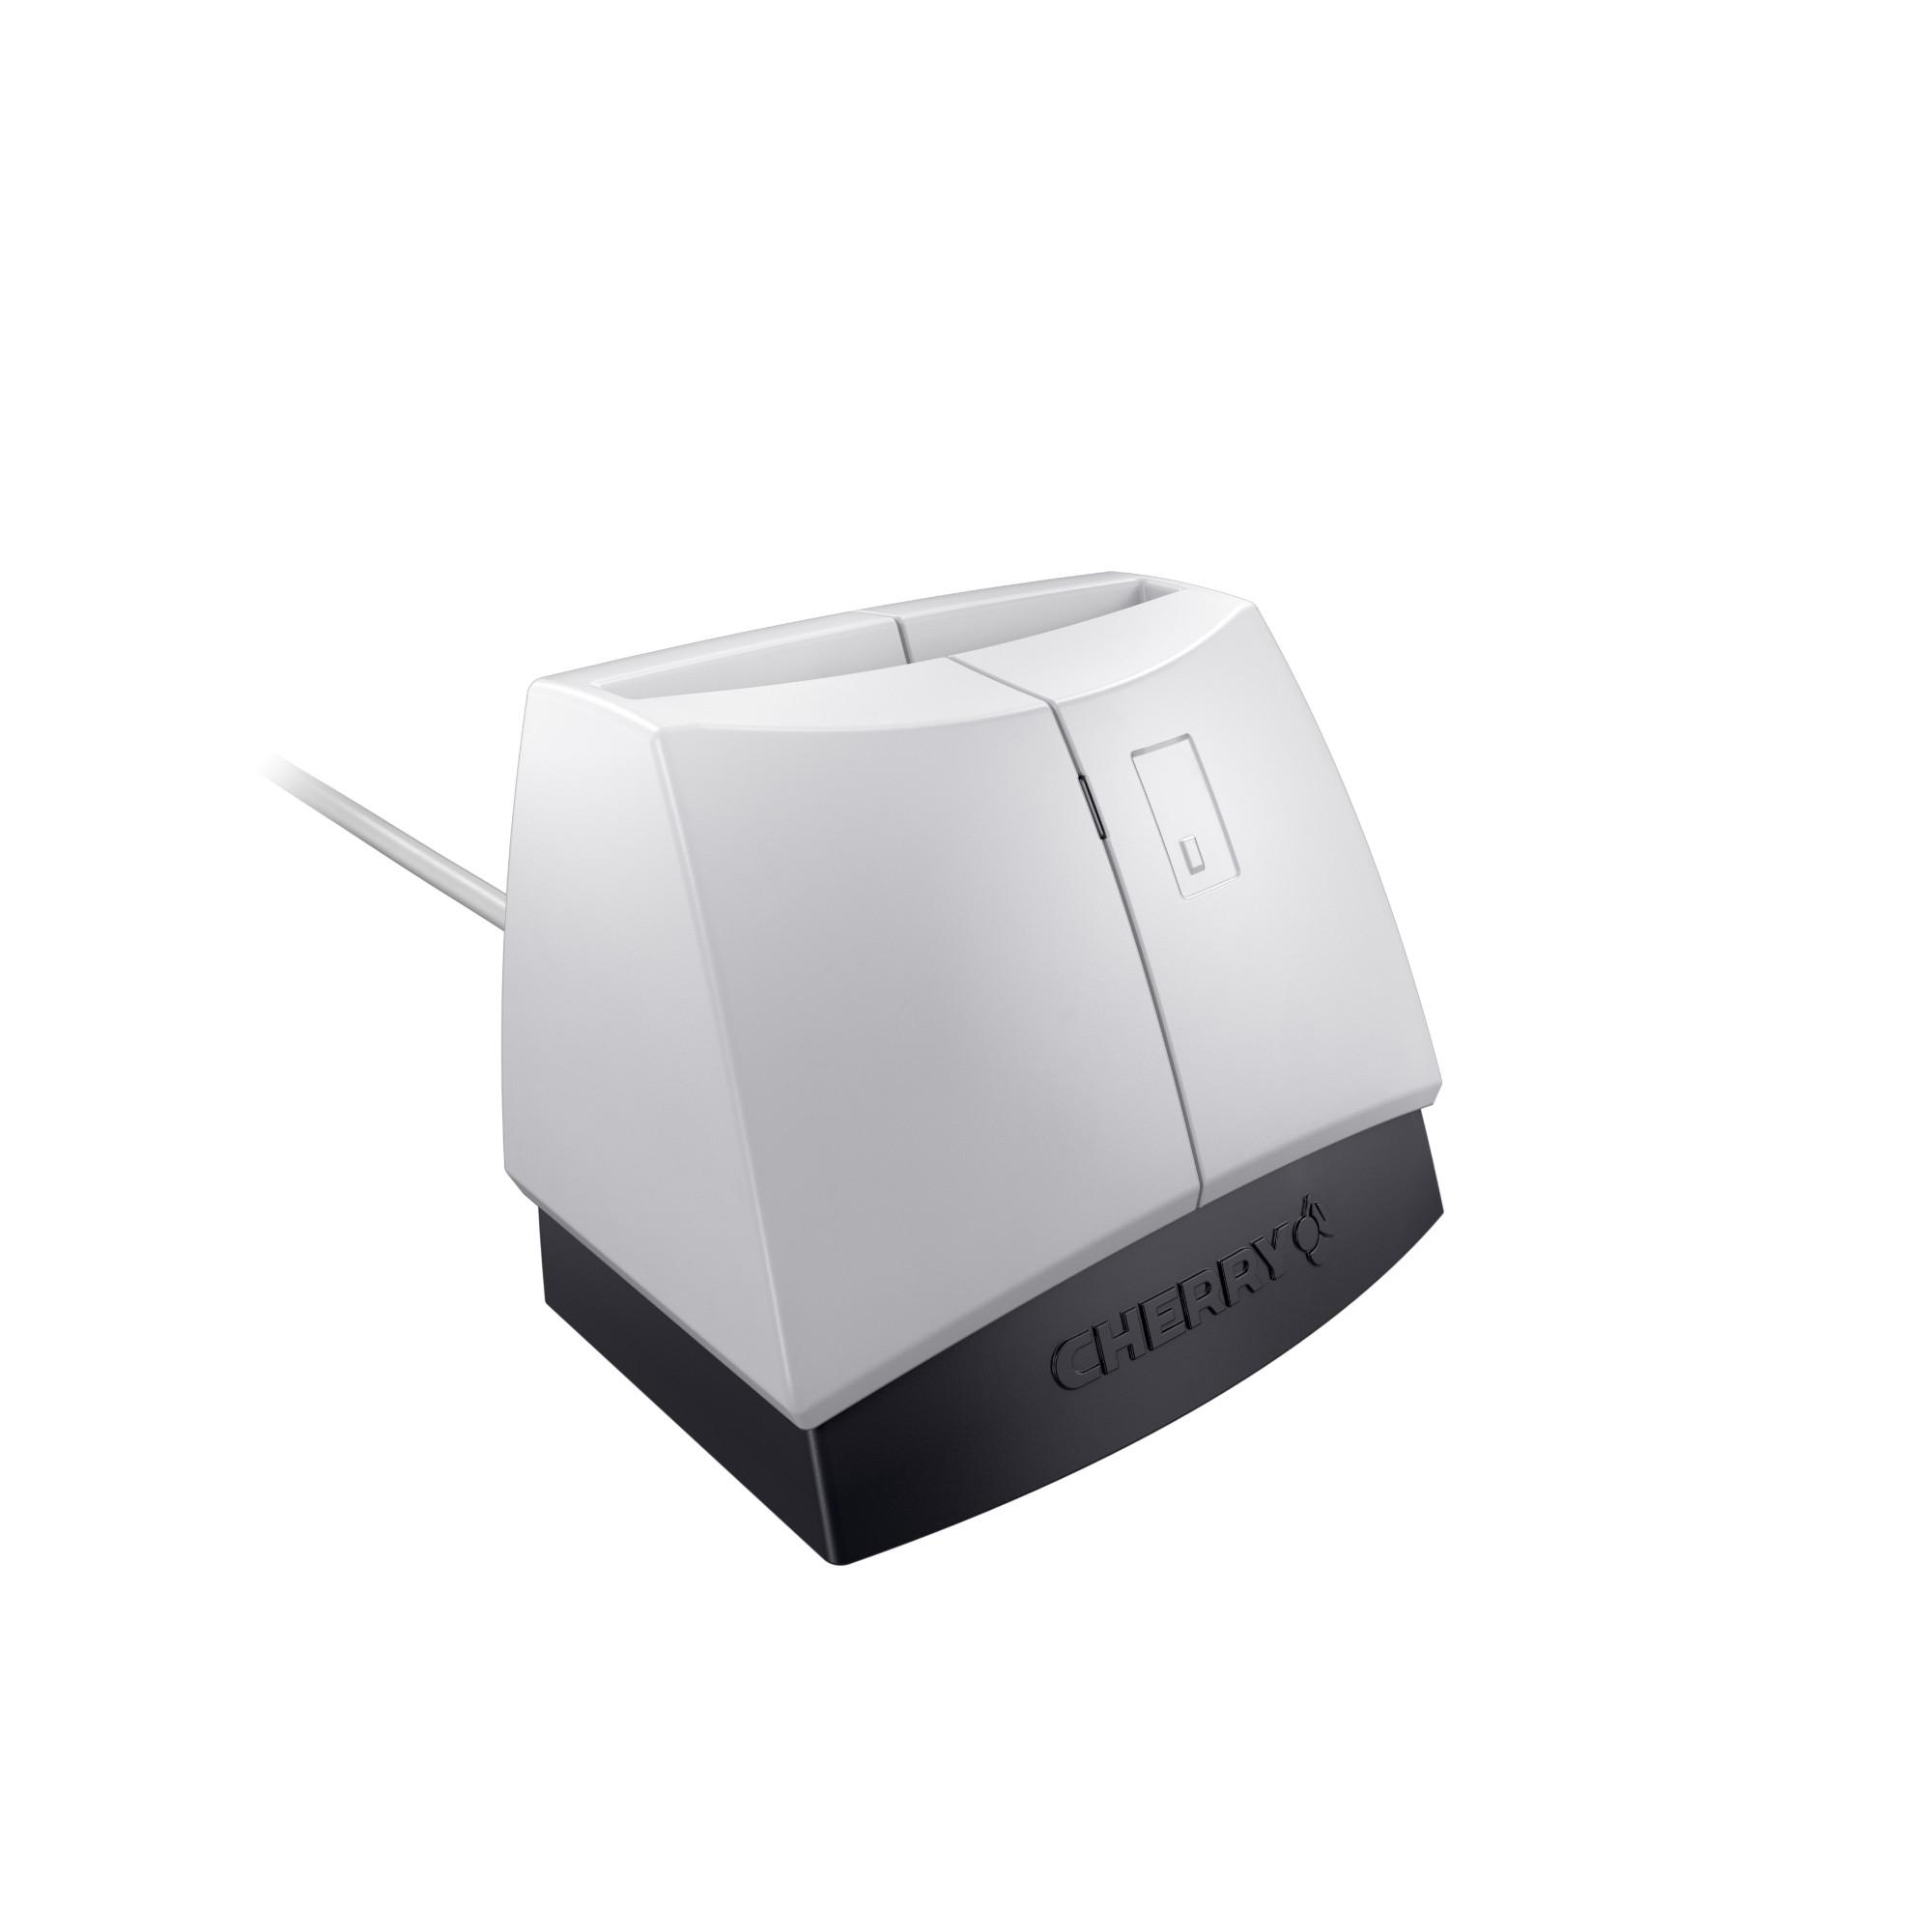 SmartTerminal ST-1144 Smart Card Reader USB